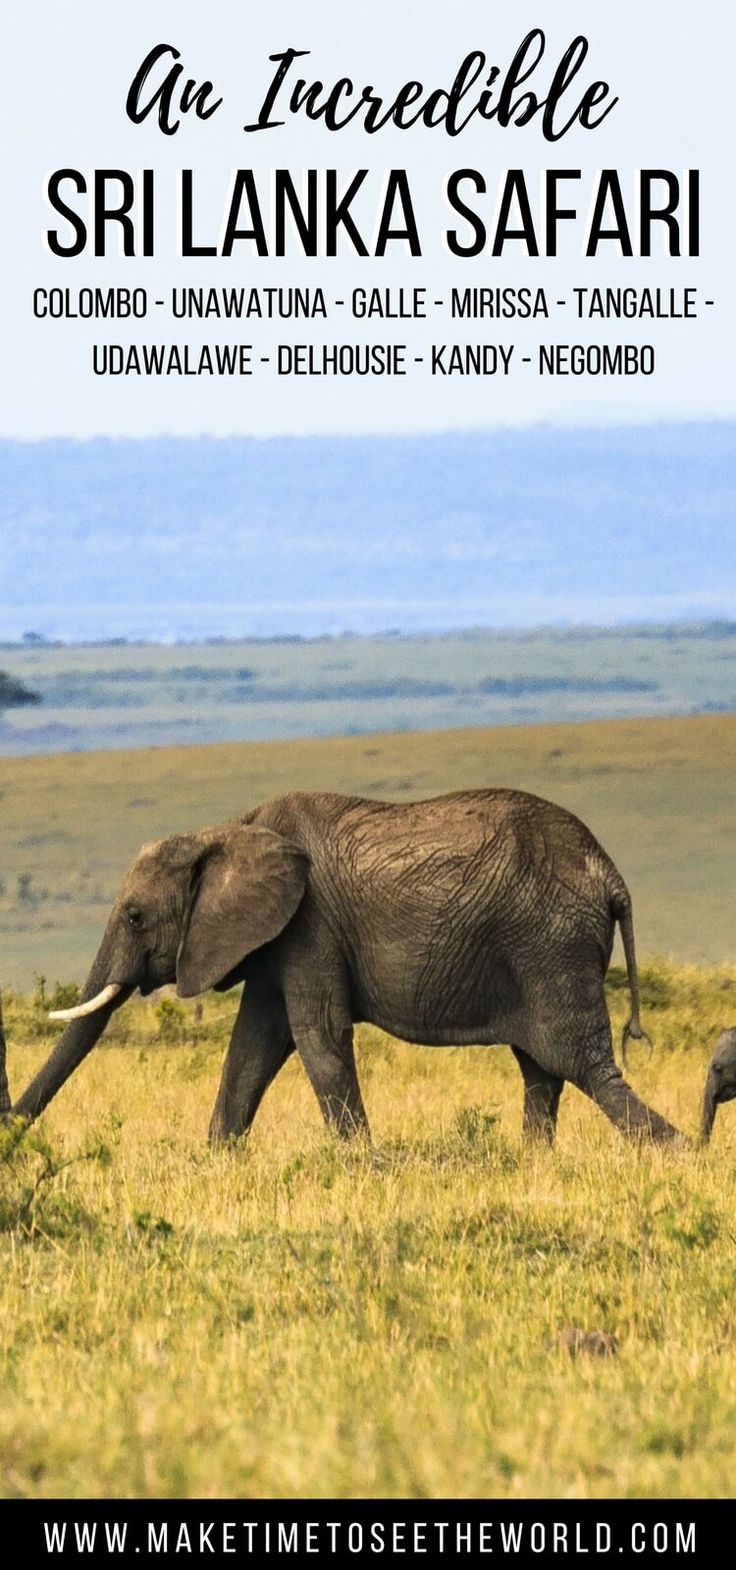 [REVIEW] Take in Sri Lanka's highlights on the Trails Asia Sri Lanka Safari - an ethical, small group adventure tour for active travelers. #SriLanka #SriLankaSafari #Colombo #Negombo #Mirissa #Kandy #AdamsPeak Sri Lanka Itinerary | Sri Lanka Travel | Kandy | Mirissa | Colombo | Negombo